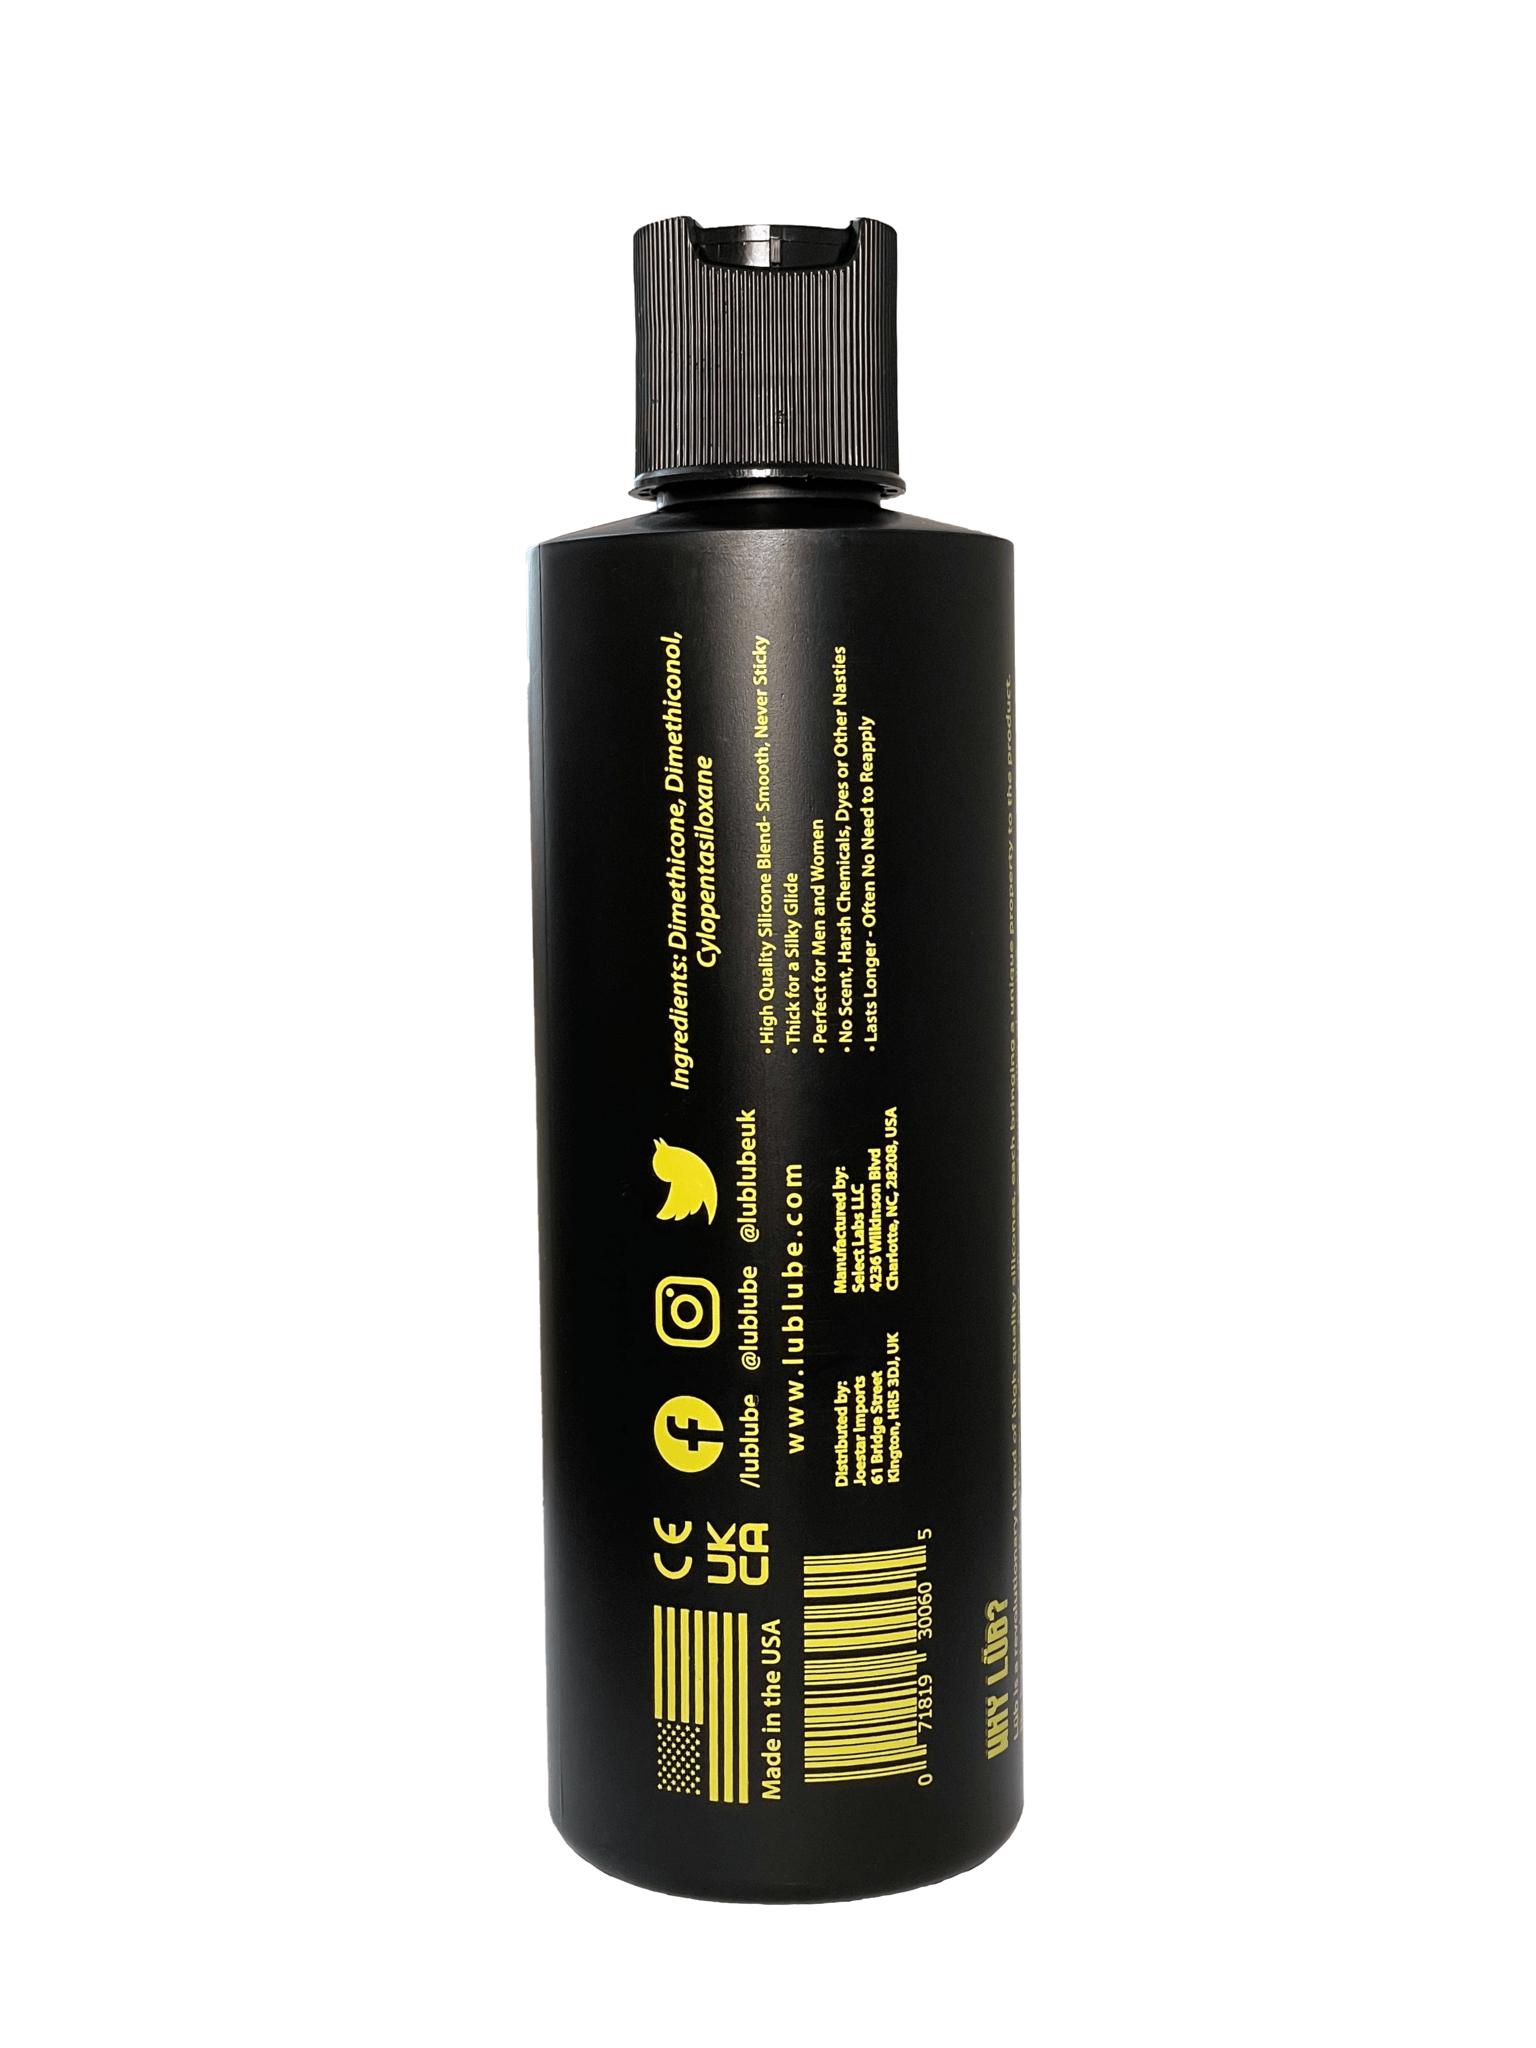 Lüb Lube, Premium Silicone Lubricant, Full Size – 8oz